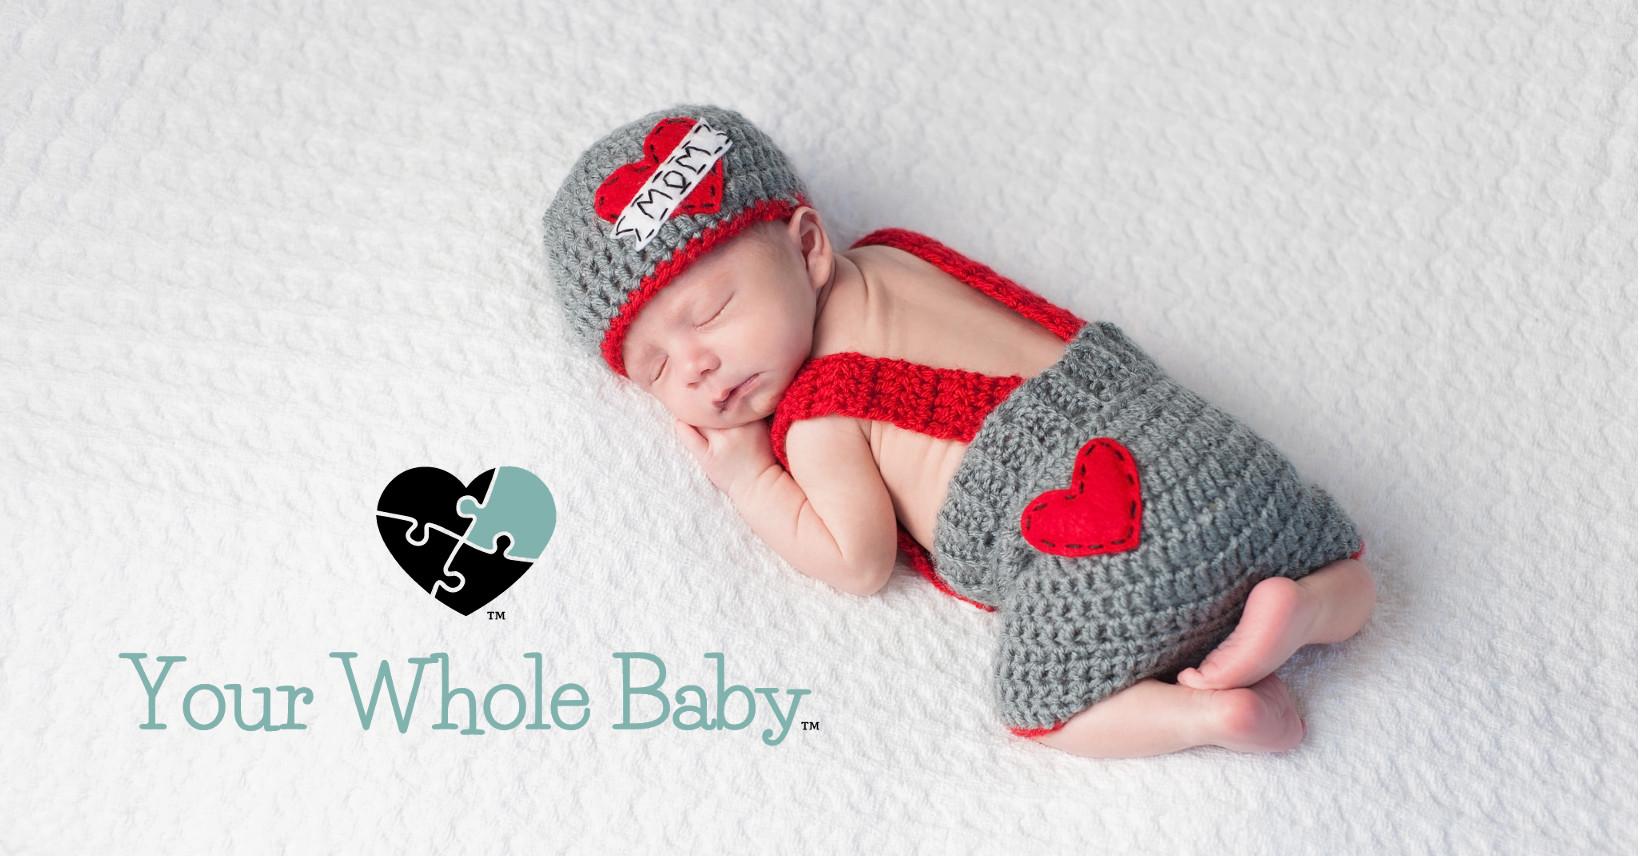 heart baby cover photo 3.jpg